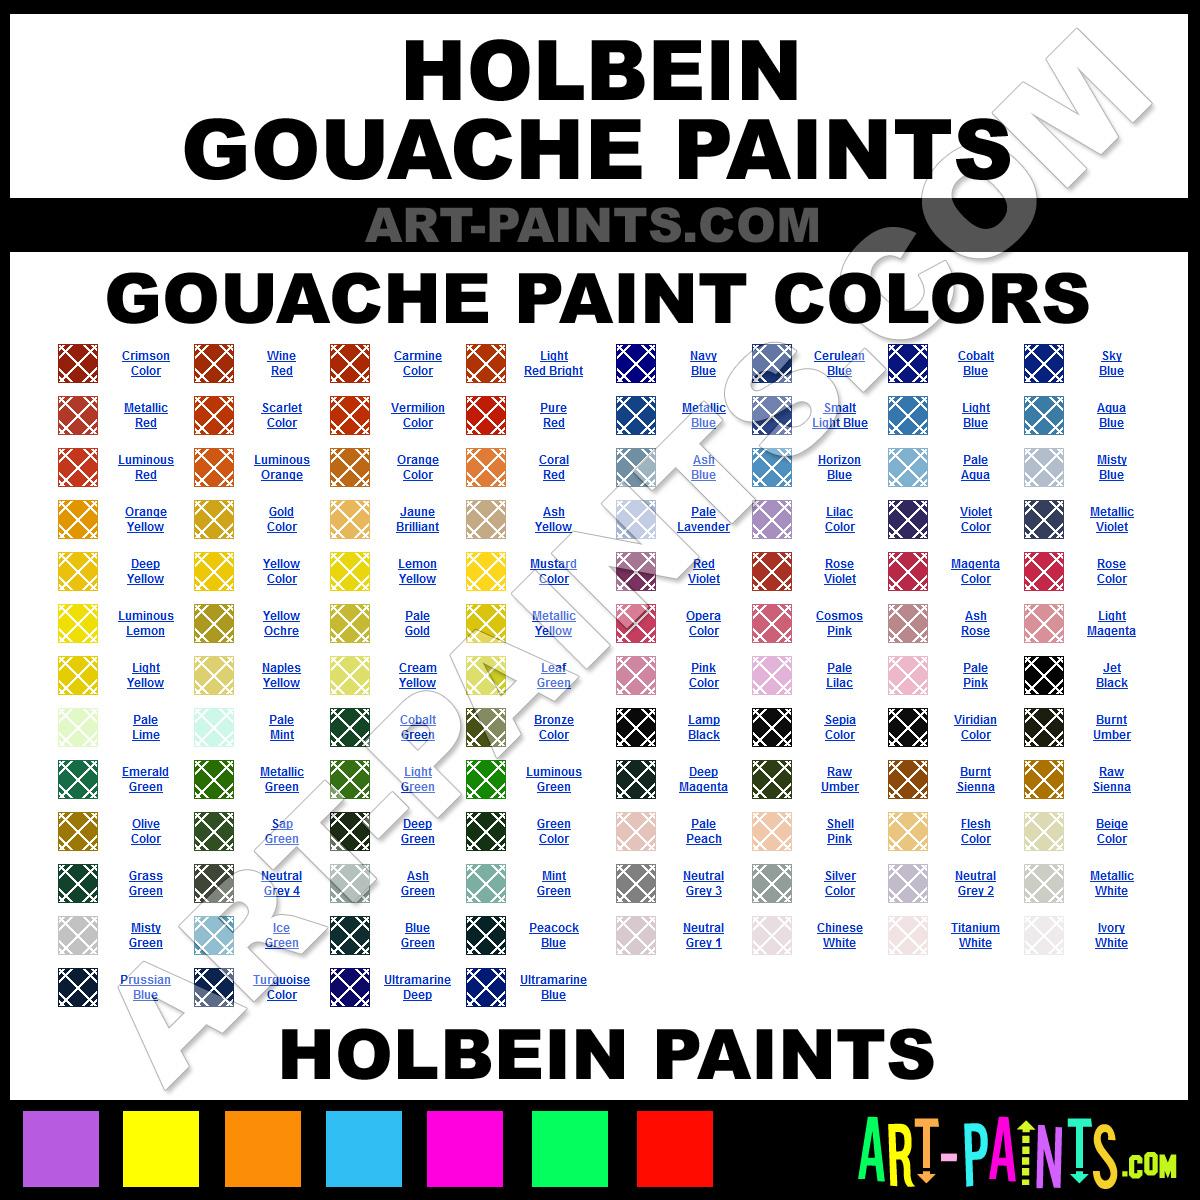 Holbein gouache paint brands holbein paint brands gouache paint holbein gouache paints holbein paints nvjuhfo Choice Image